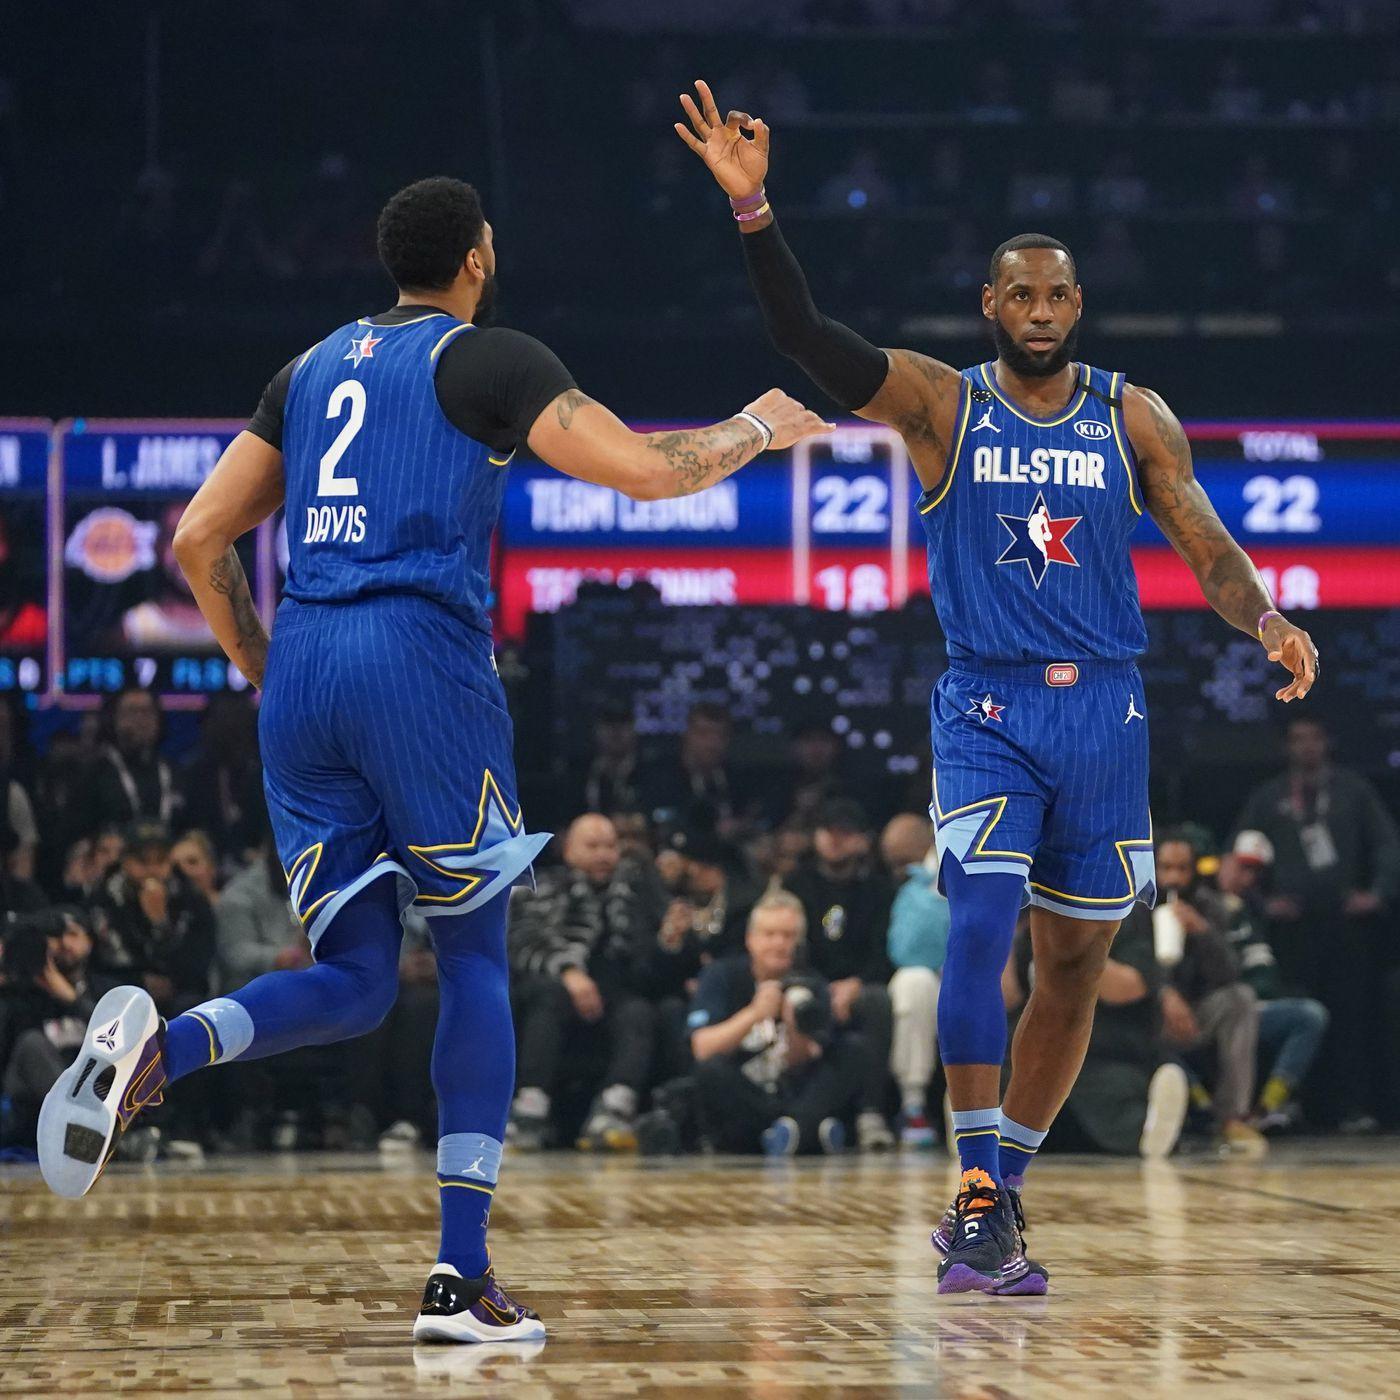 Nba All Star Game 2020 Final Score Fantasy Basketball Stats Highlights Draftkings Nation